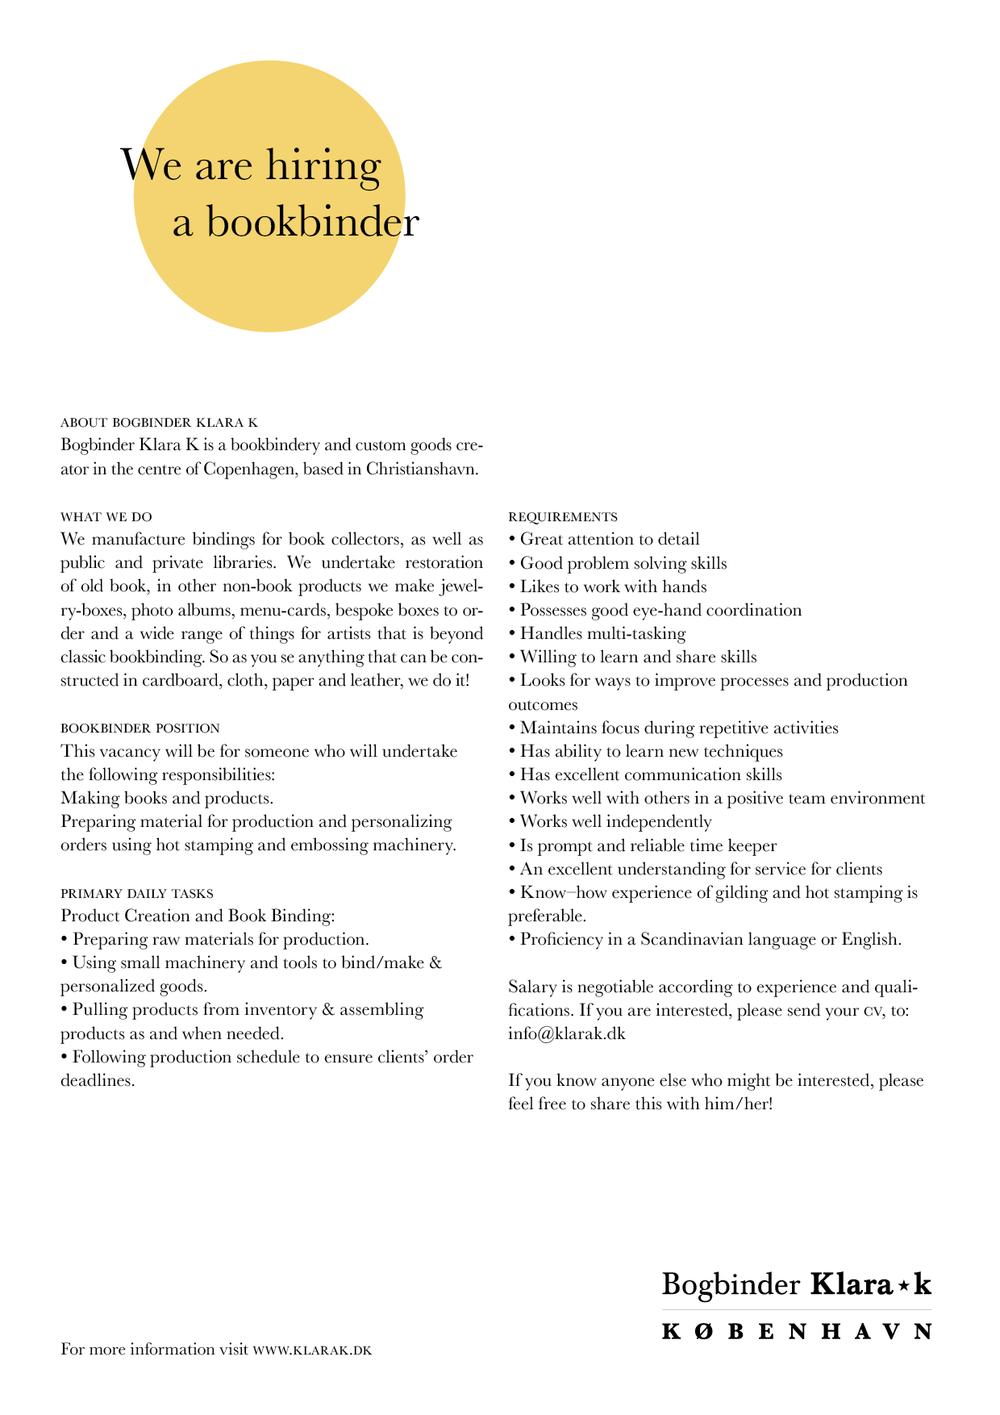 klara_k-pdf-bb.png